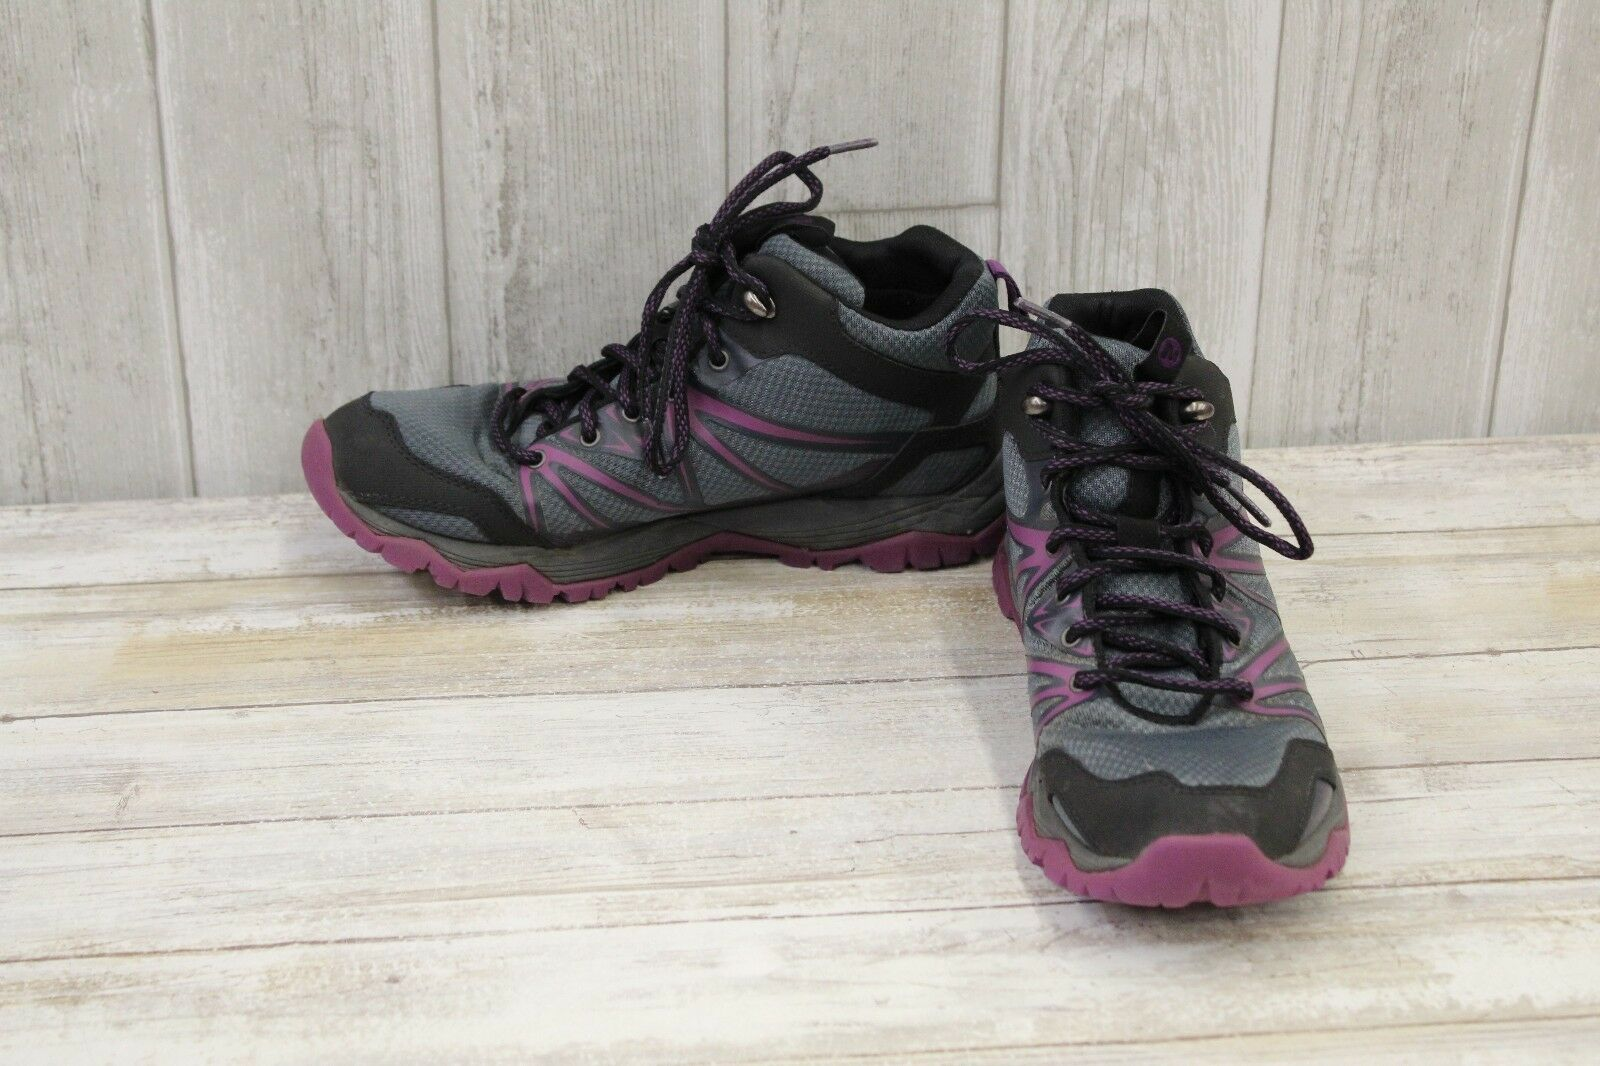 Merrell Capra Rise Mid Waterproof Hiking Shoes, Women's Size 8, Grey/Purple